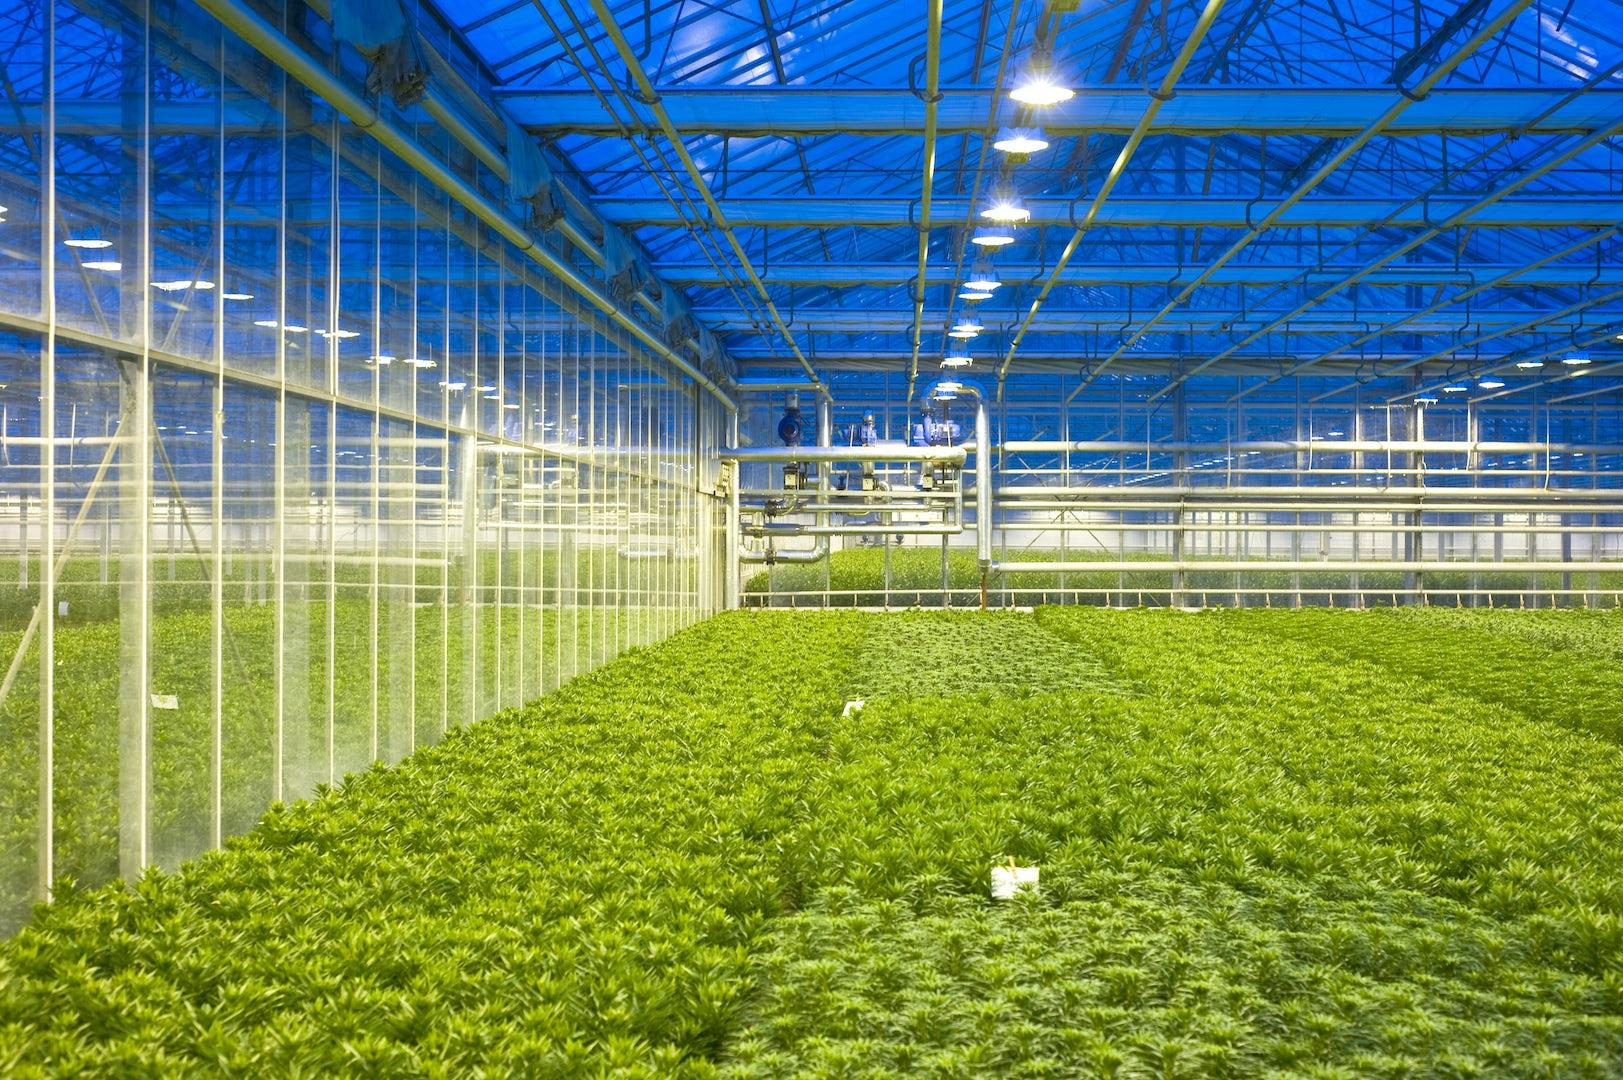 Greenhouse Lighting Verlichting hotraco